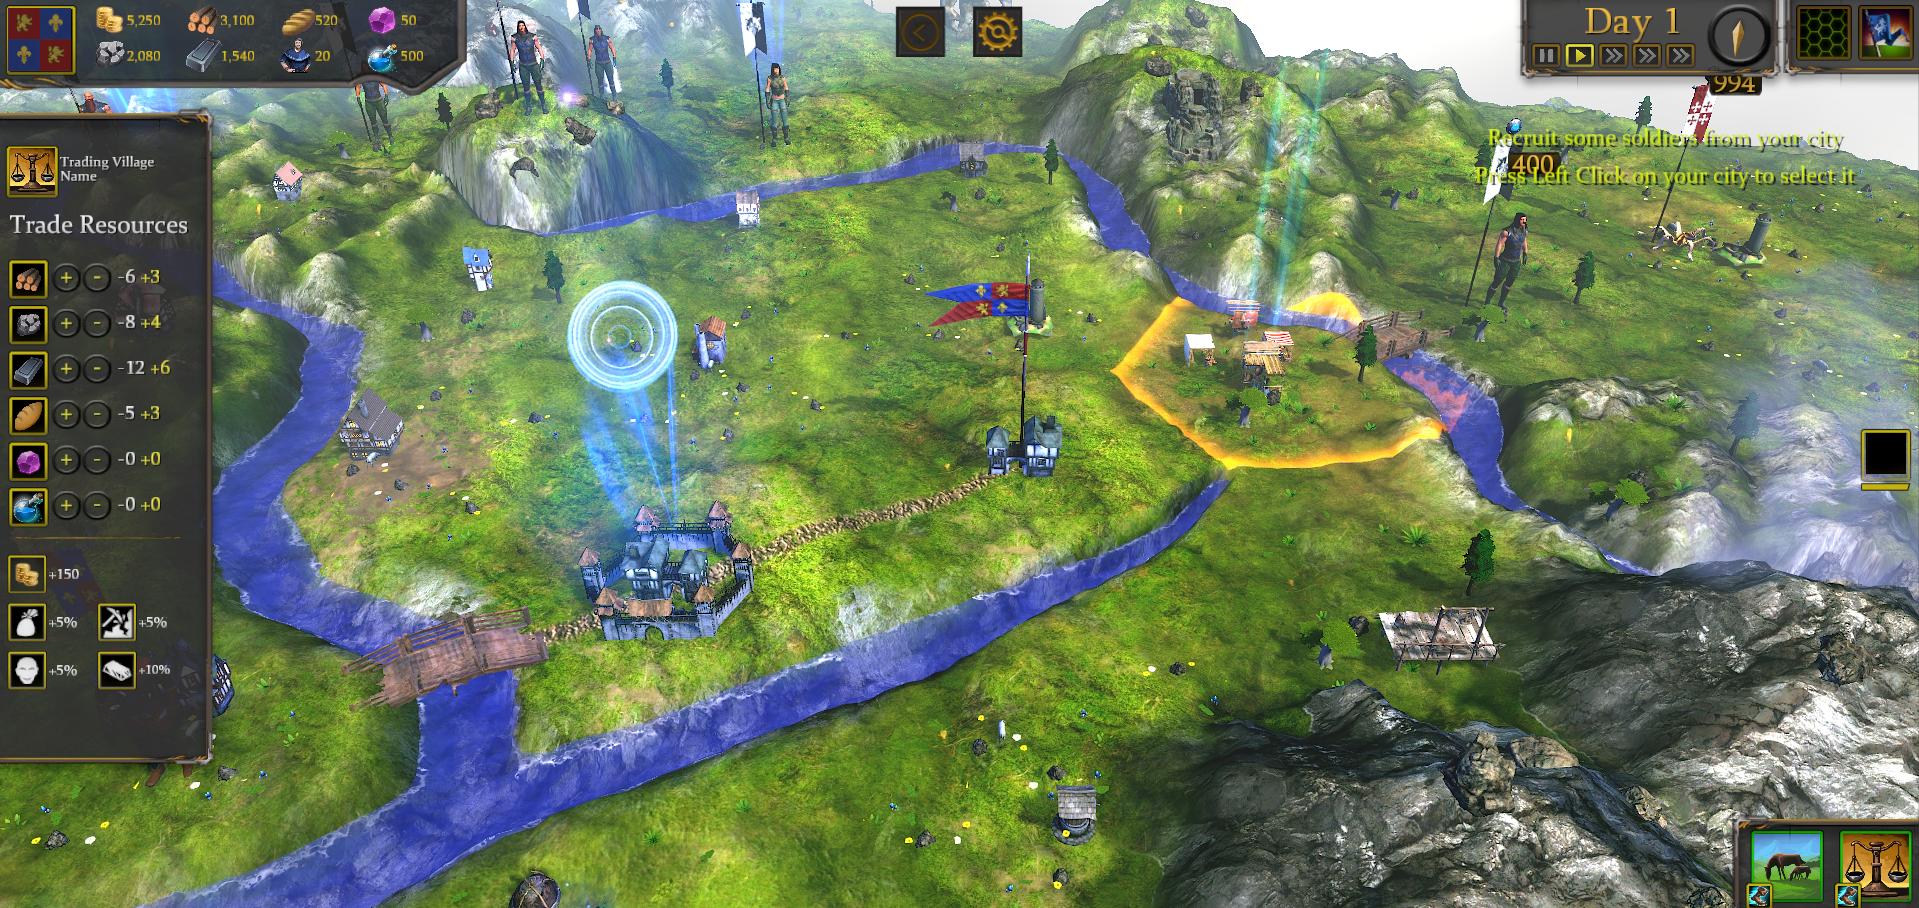 fe508w9uPKYQq32DXbKGWamPl341 | RPG Jeuxvidéo